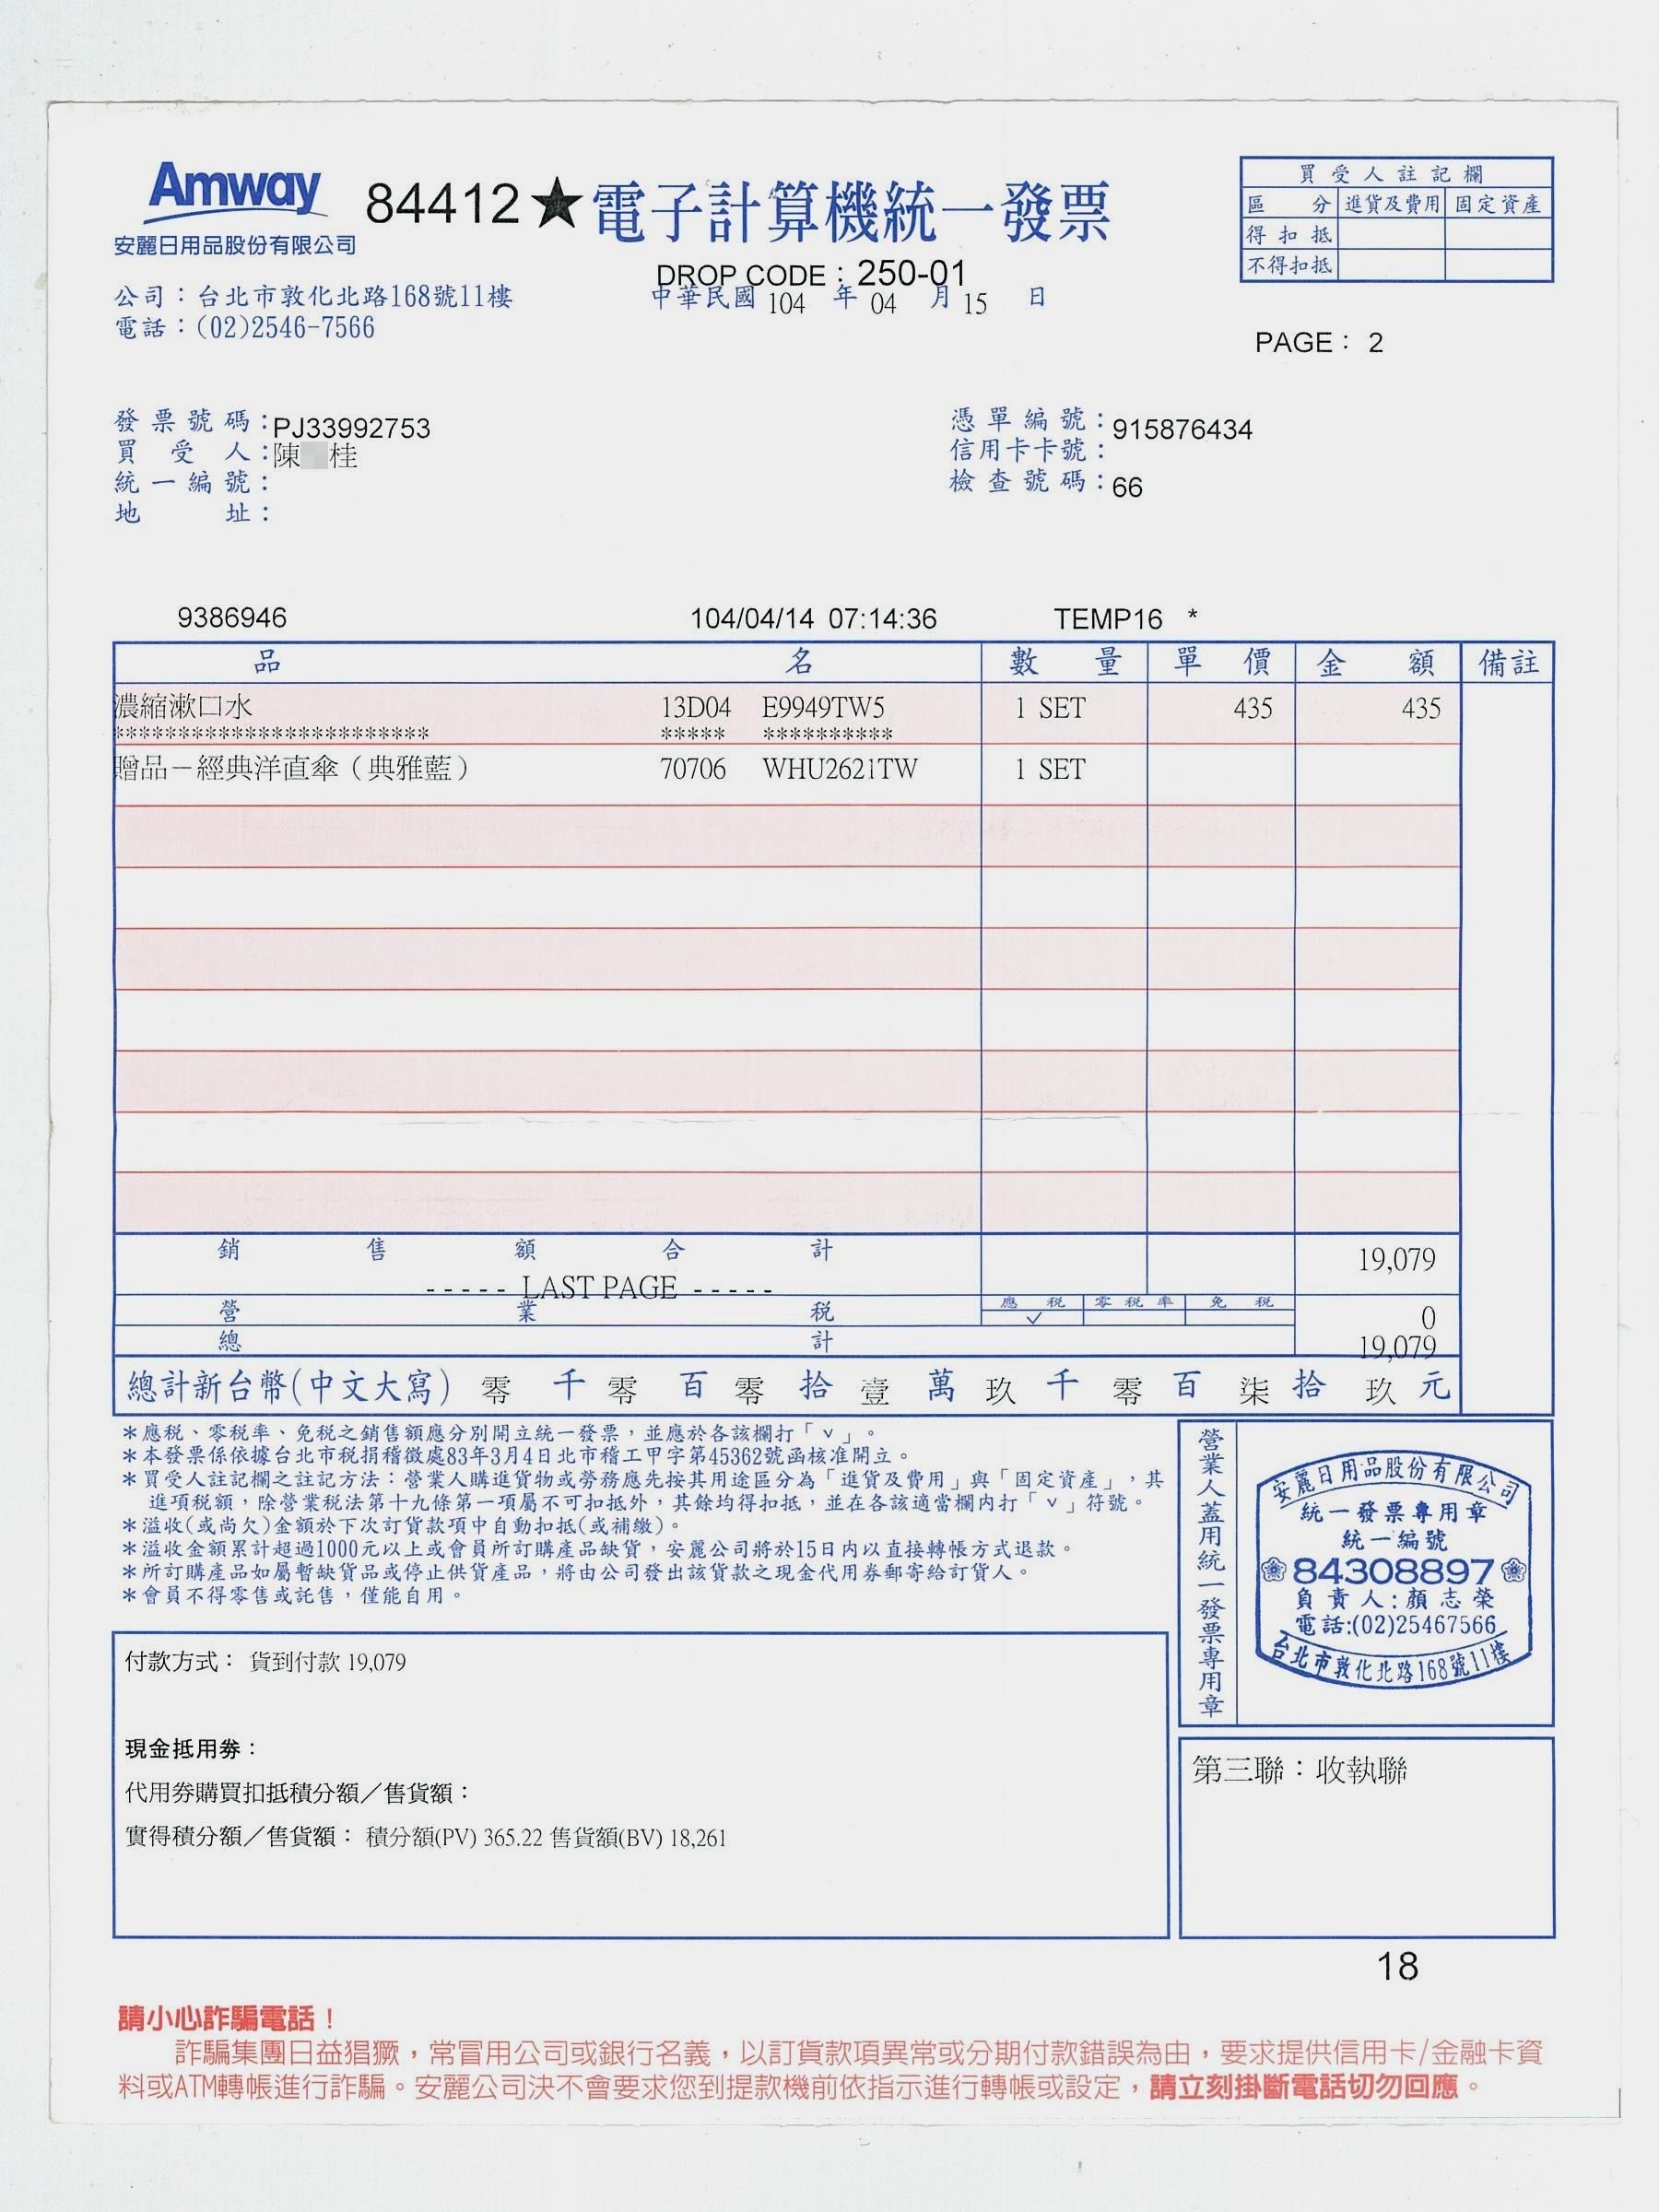 FileAmway Taiwan Uniform Invoice Jpg Wikimedia Commons - Invoice jpg